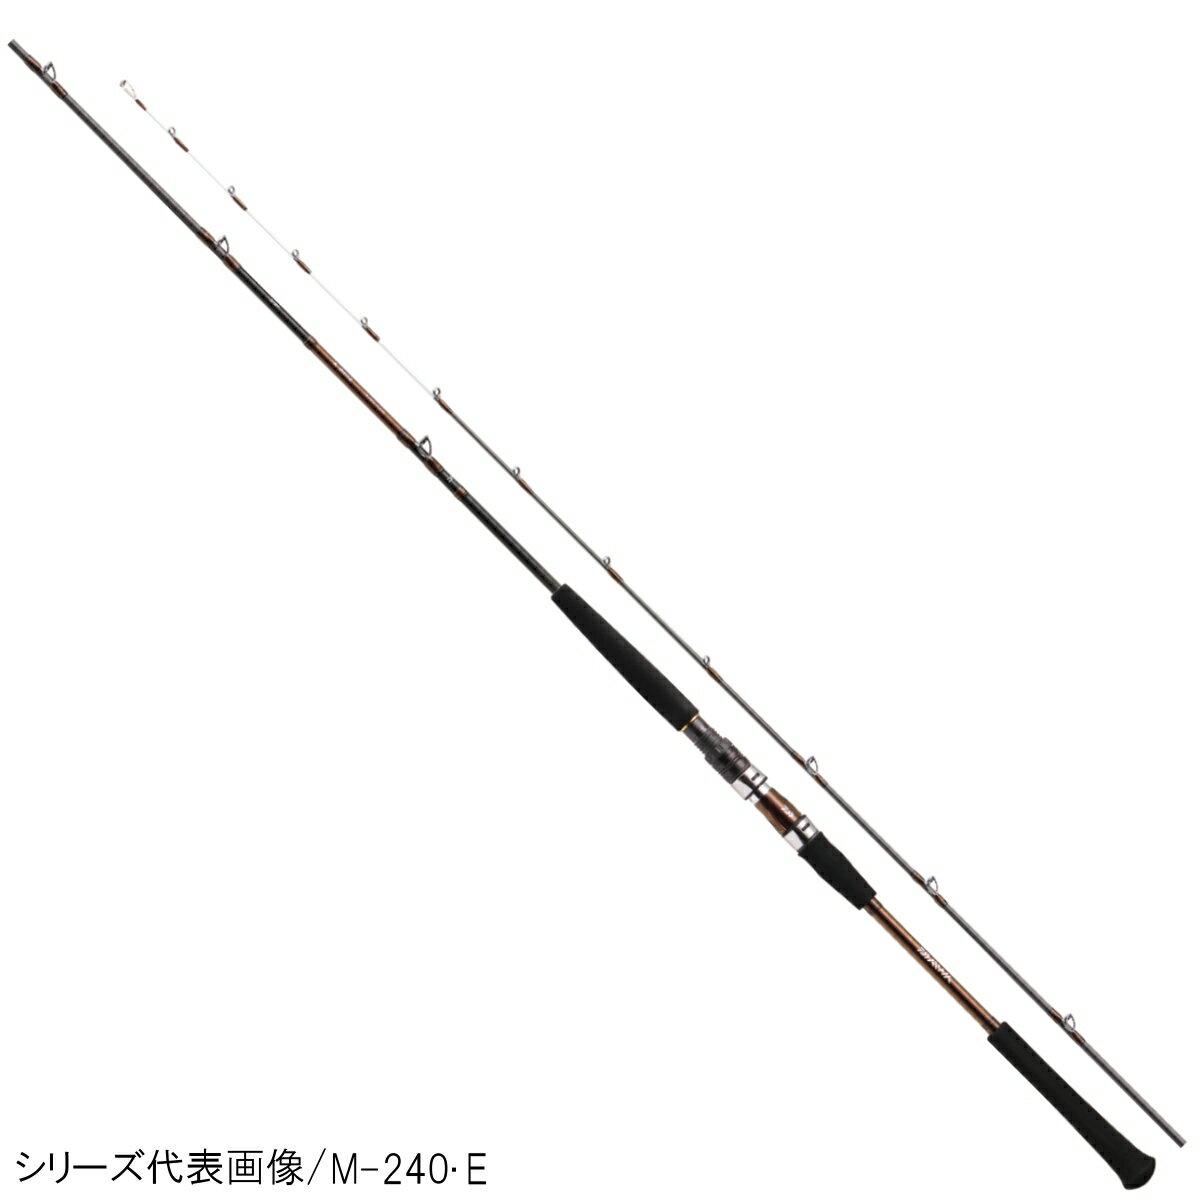 A-ブリッツ ネライ ML-180・E ダイワ【同梱不可】